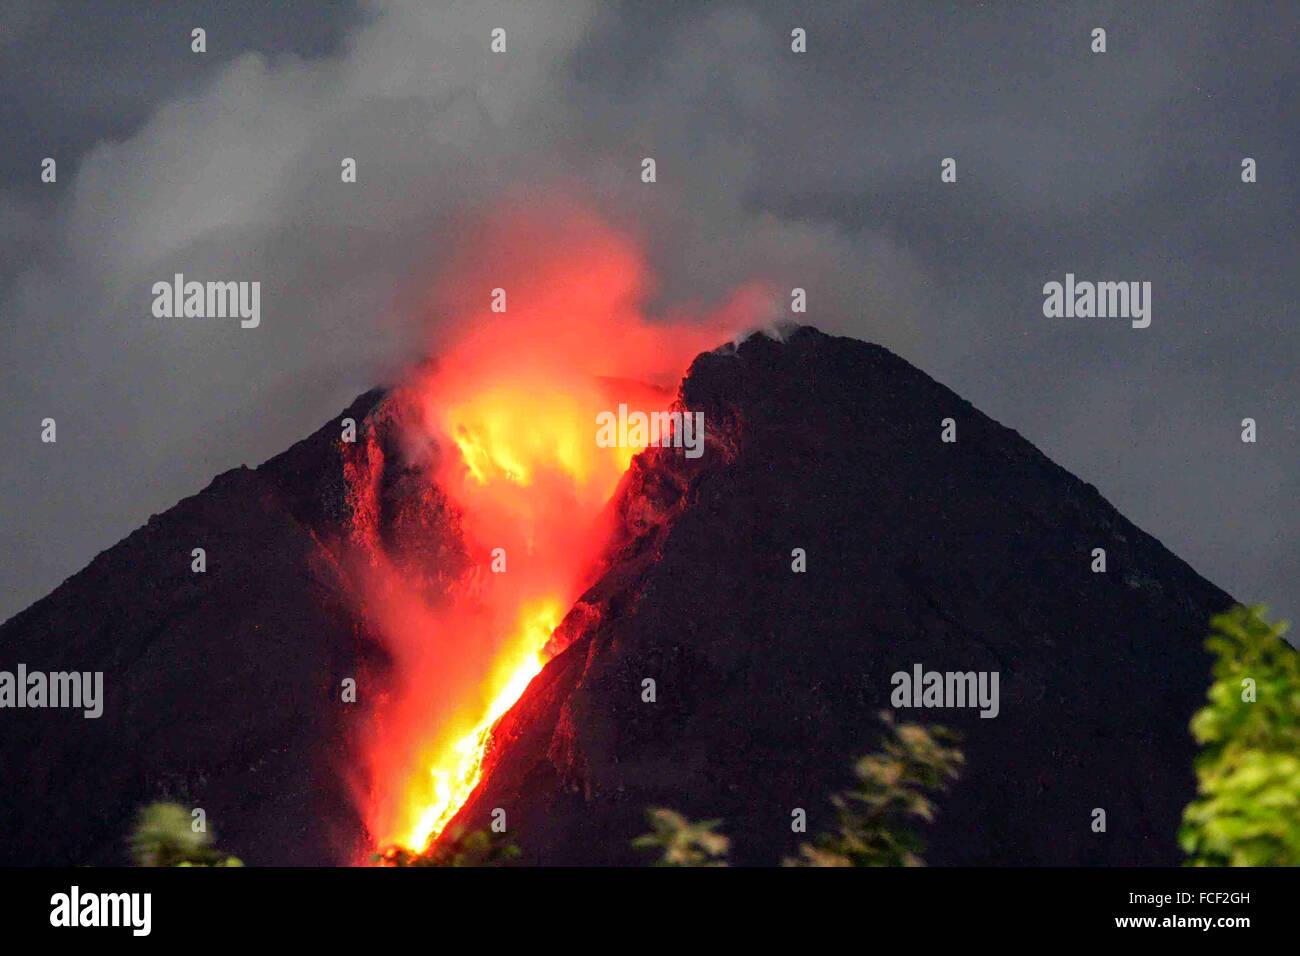 Mount Merapi Eruption Seen From Deles Village, Klaten, Java, Indonesia - Stock Image